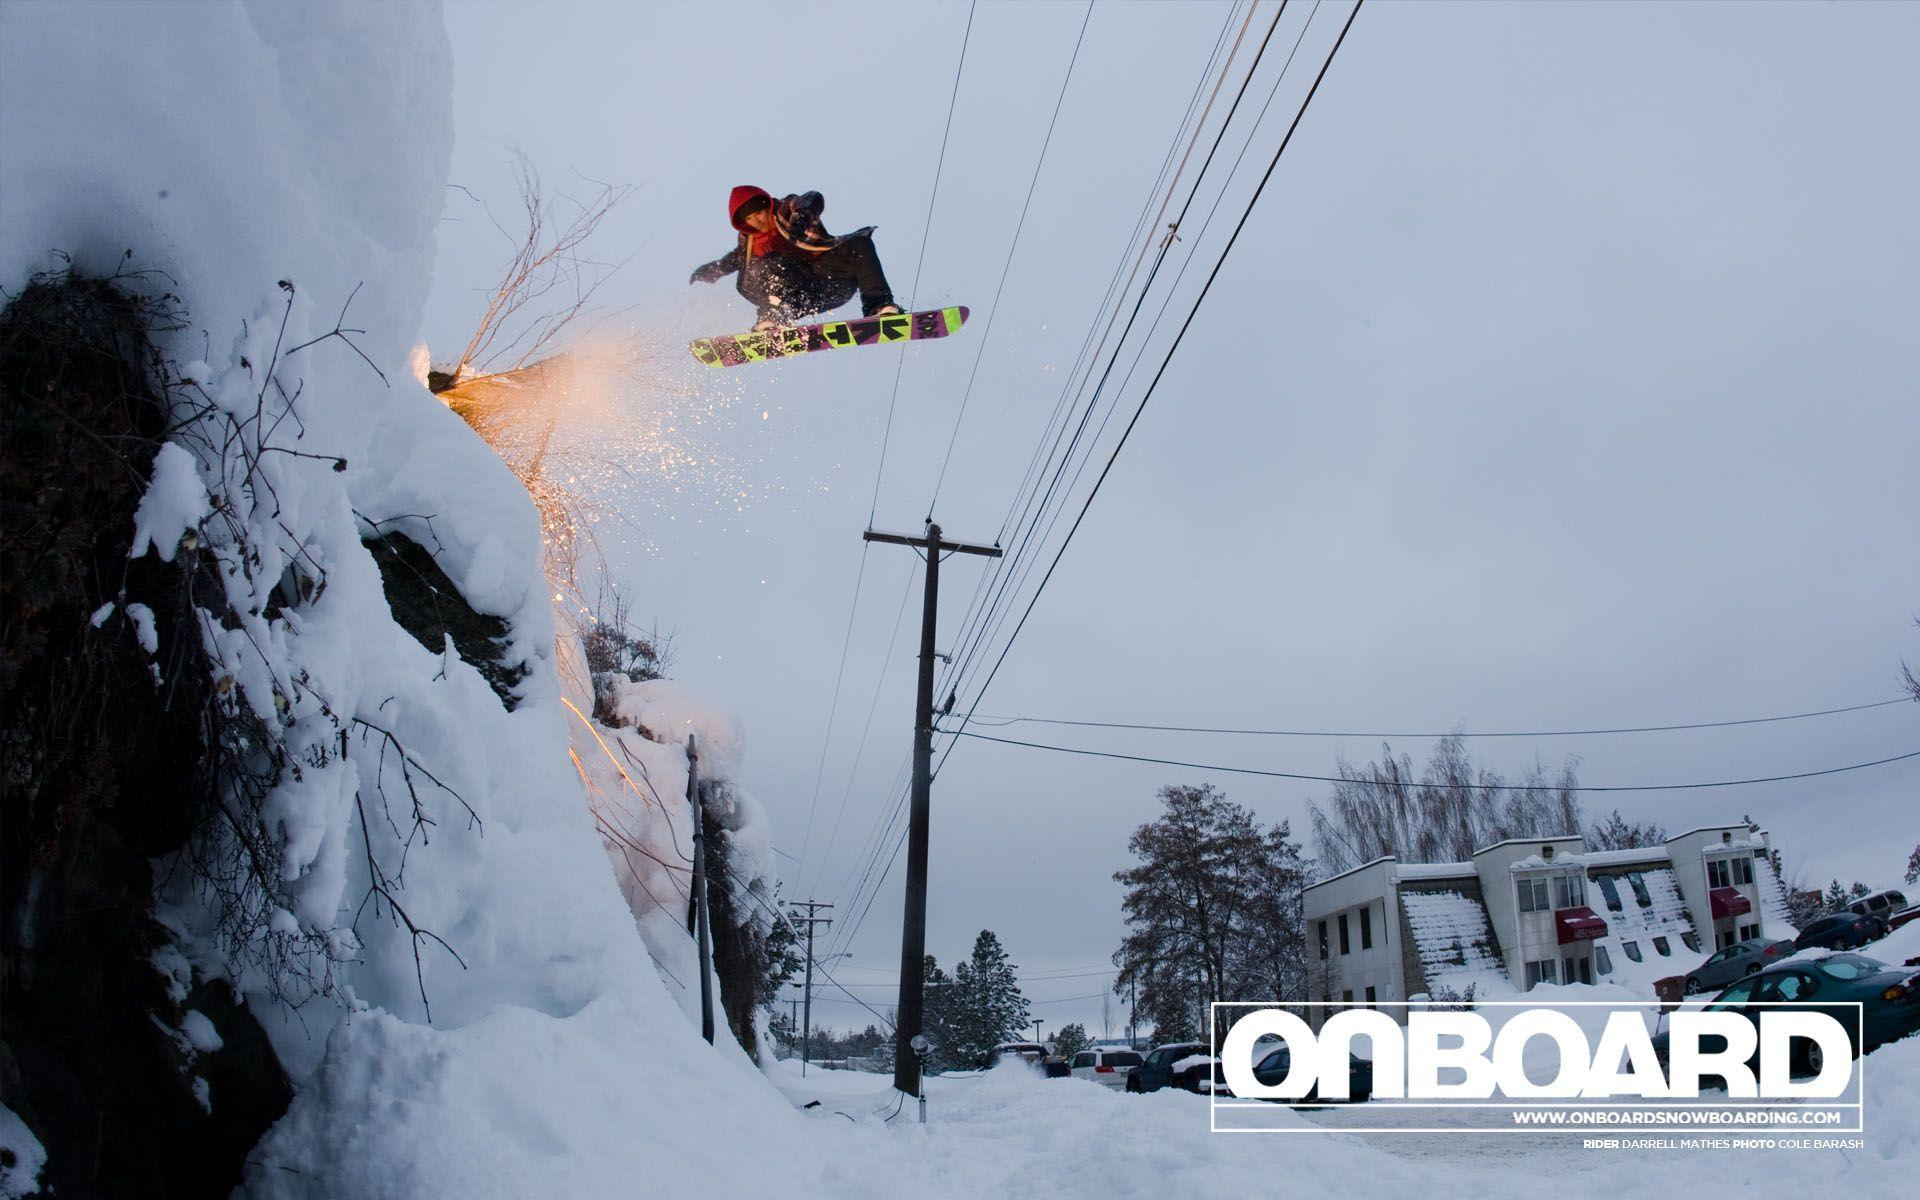 snowboarding wallpapers wallpaper - photo #25